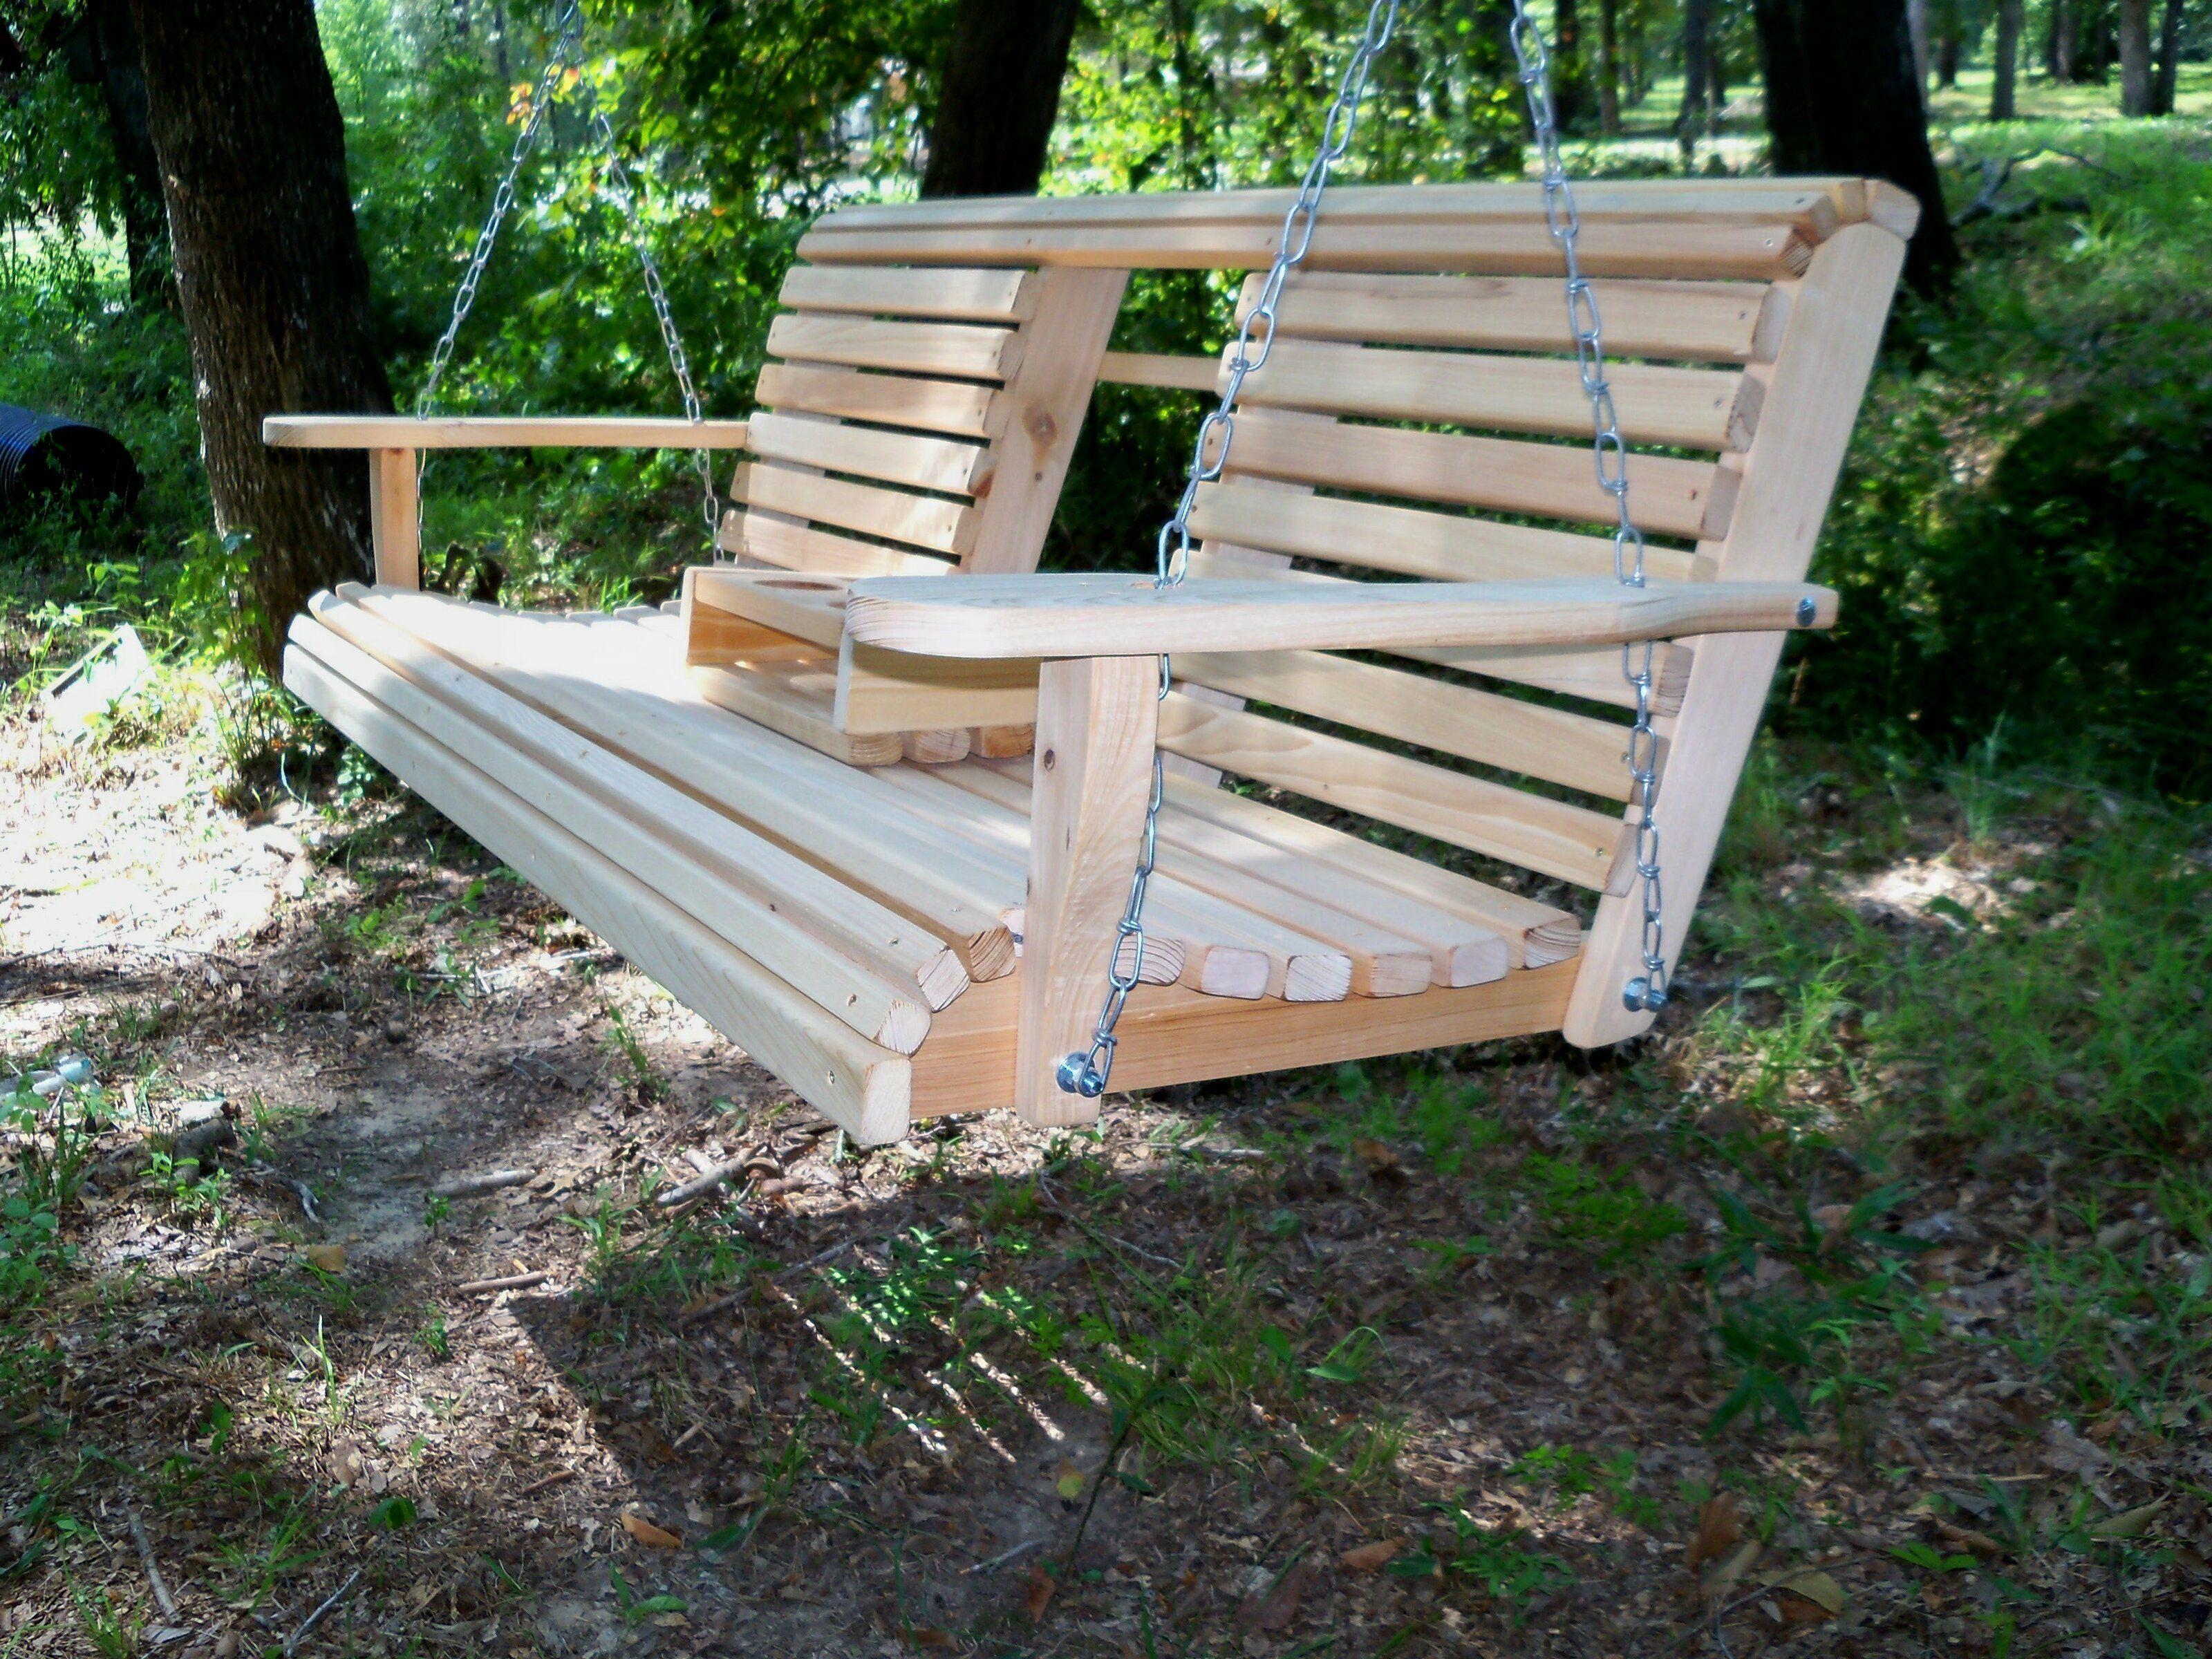 Metivier Porch Swing In 2021 Diy Porch Swing Plans Diy Porch Swing Porch Swing Wood porch swings for sale